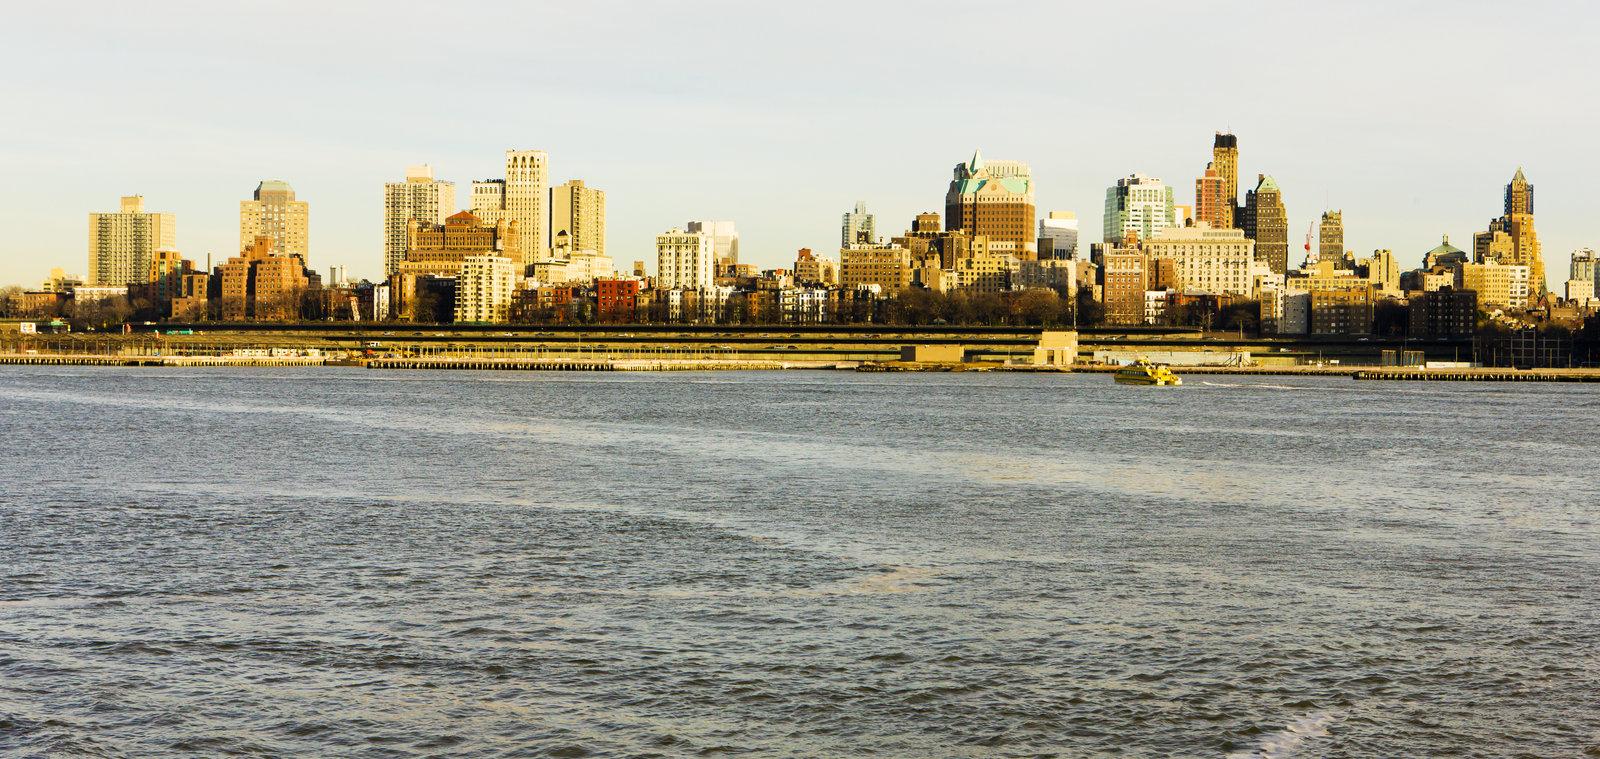 Downtown Brooklyn Brooklyn, NY Private Investigator